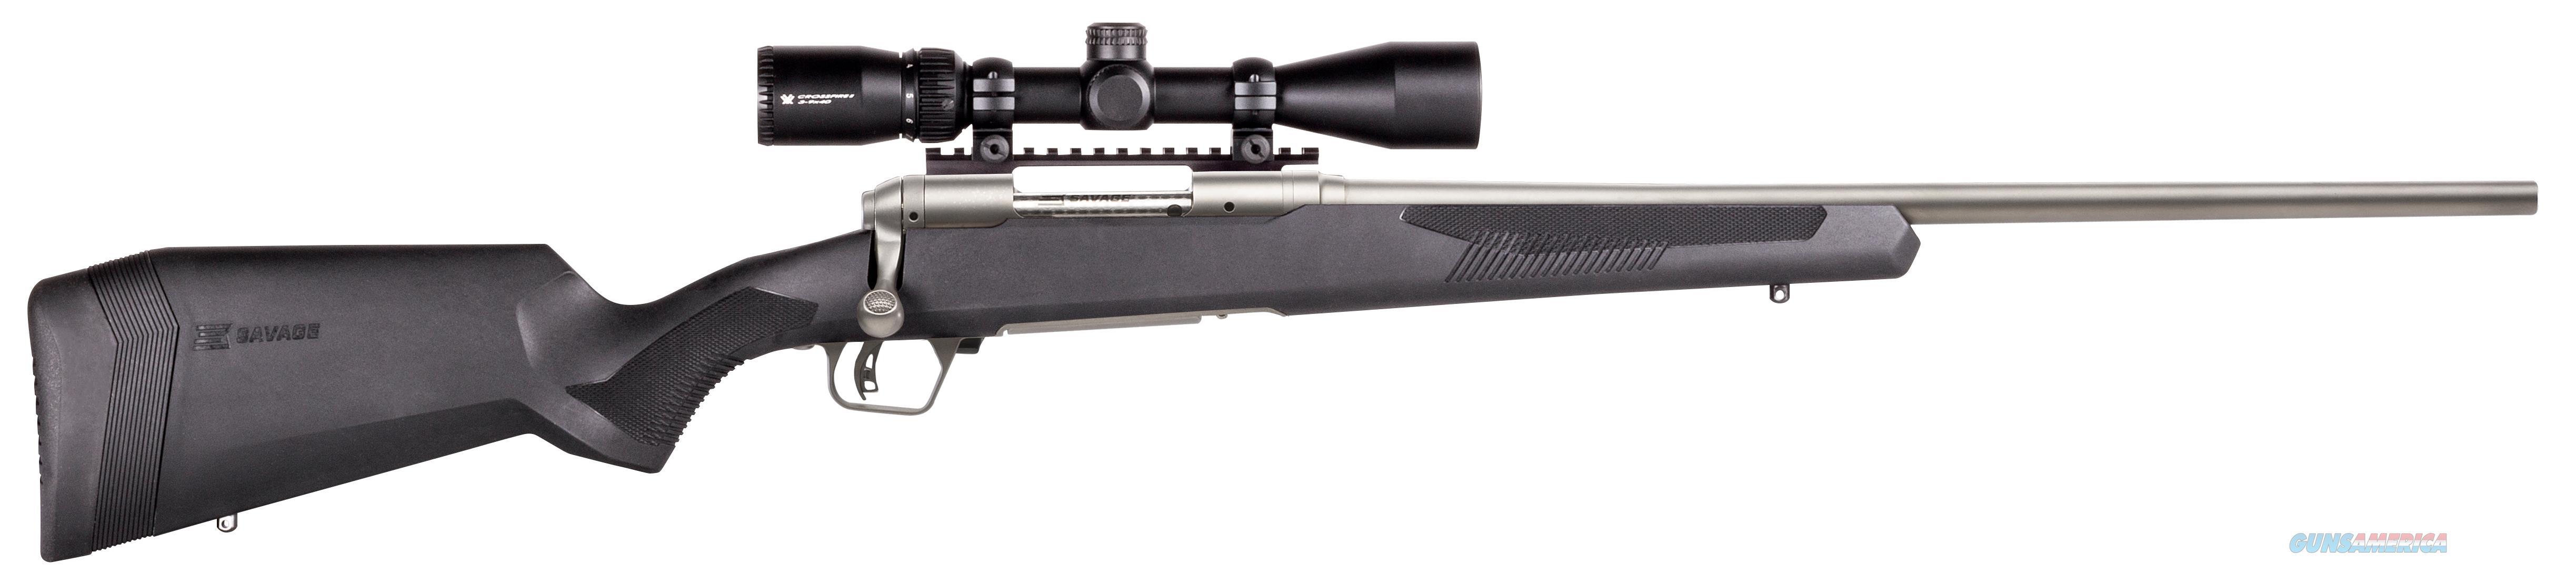 "Savage 57346 10/110 Apex Storm XP  Bolt 260 Remington 24"" 4+1 Synthetic Black Stk Stainless Steel  Guns > Rifles > S Misc Rifles"